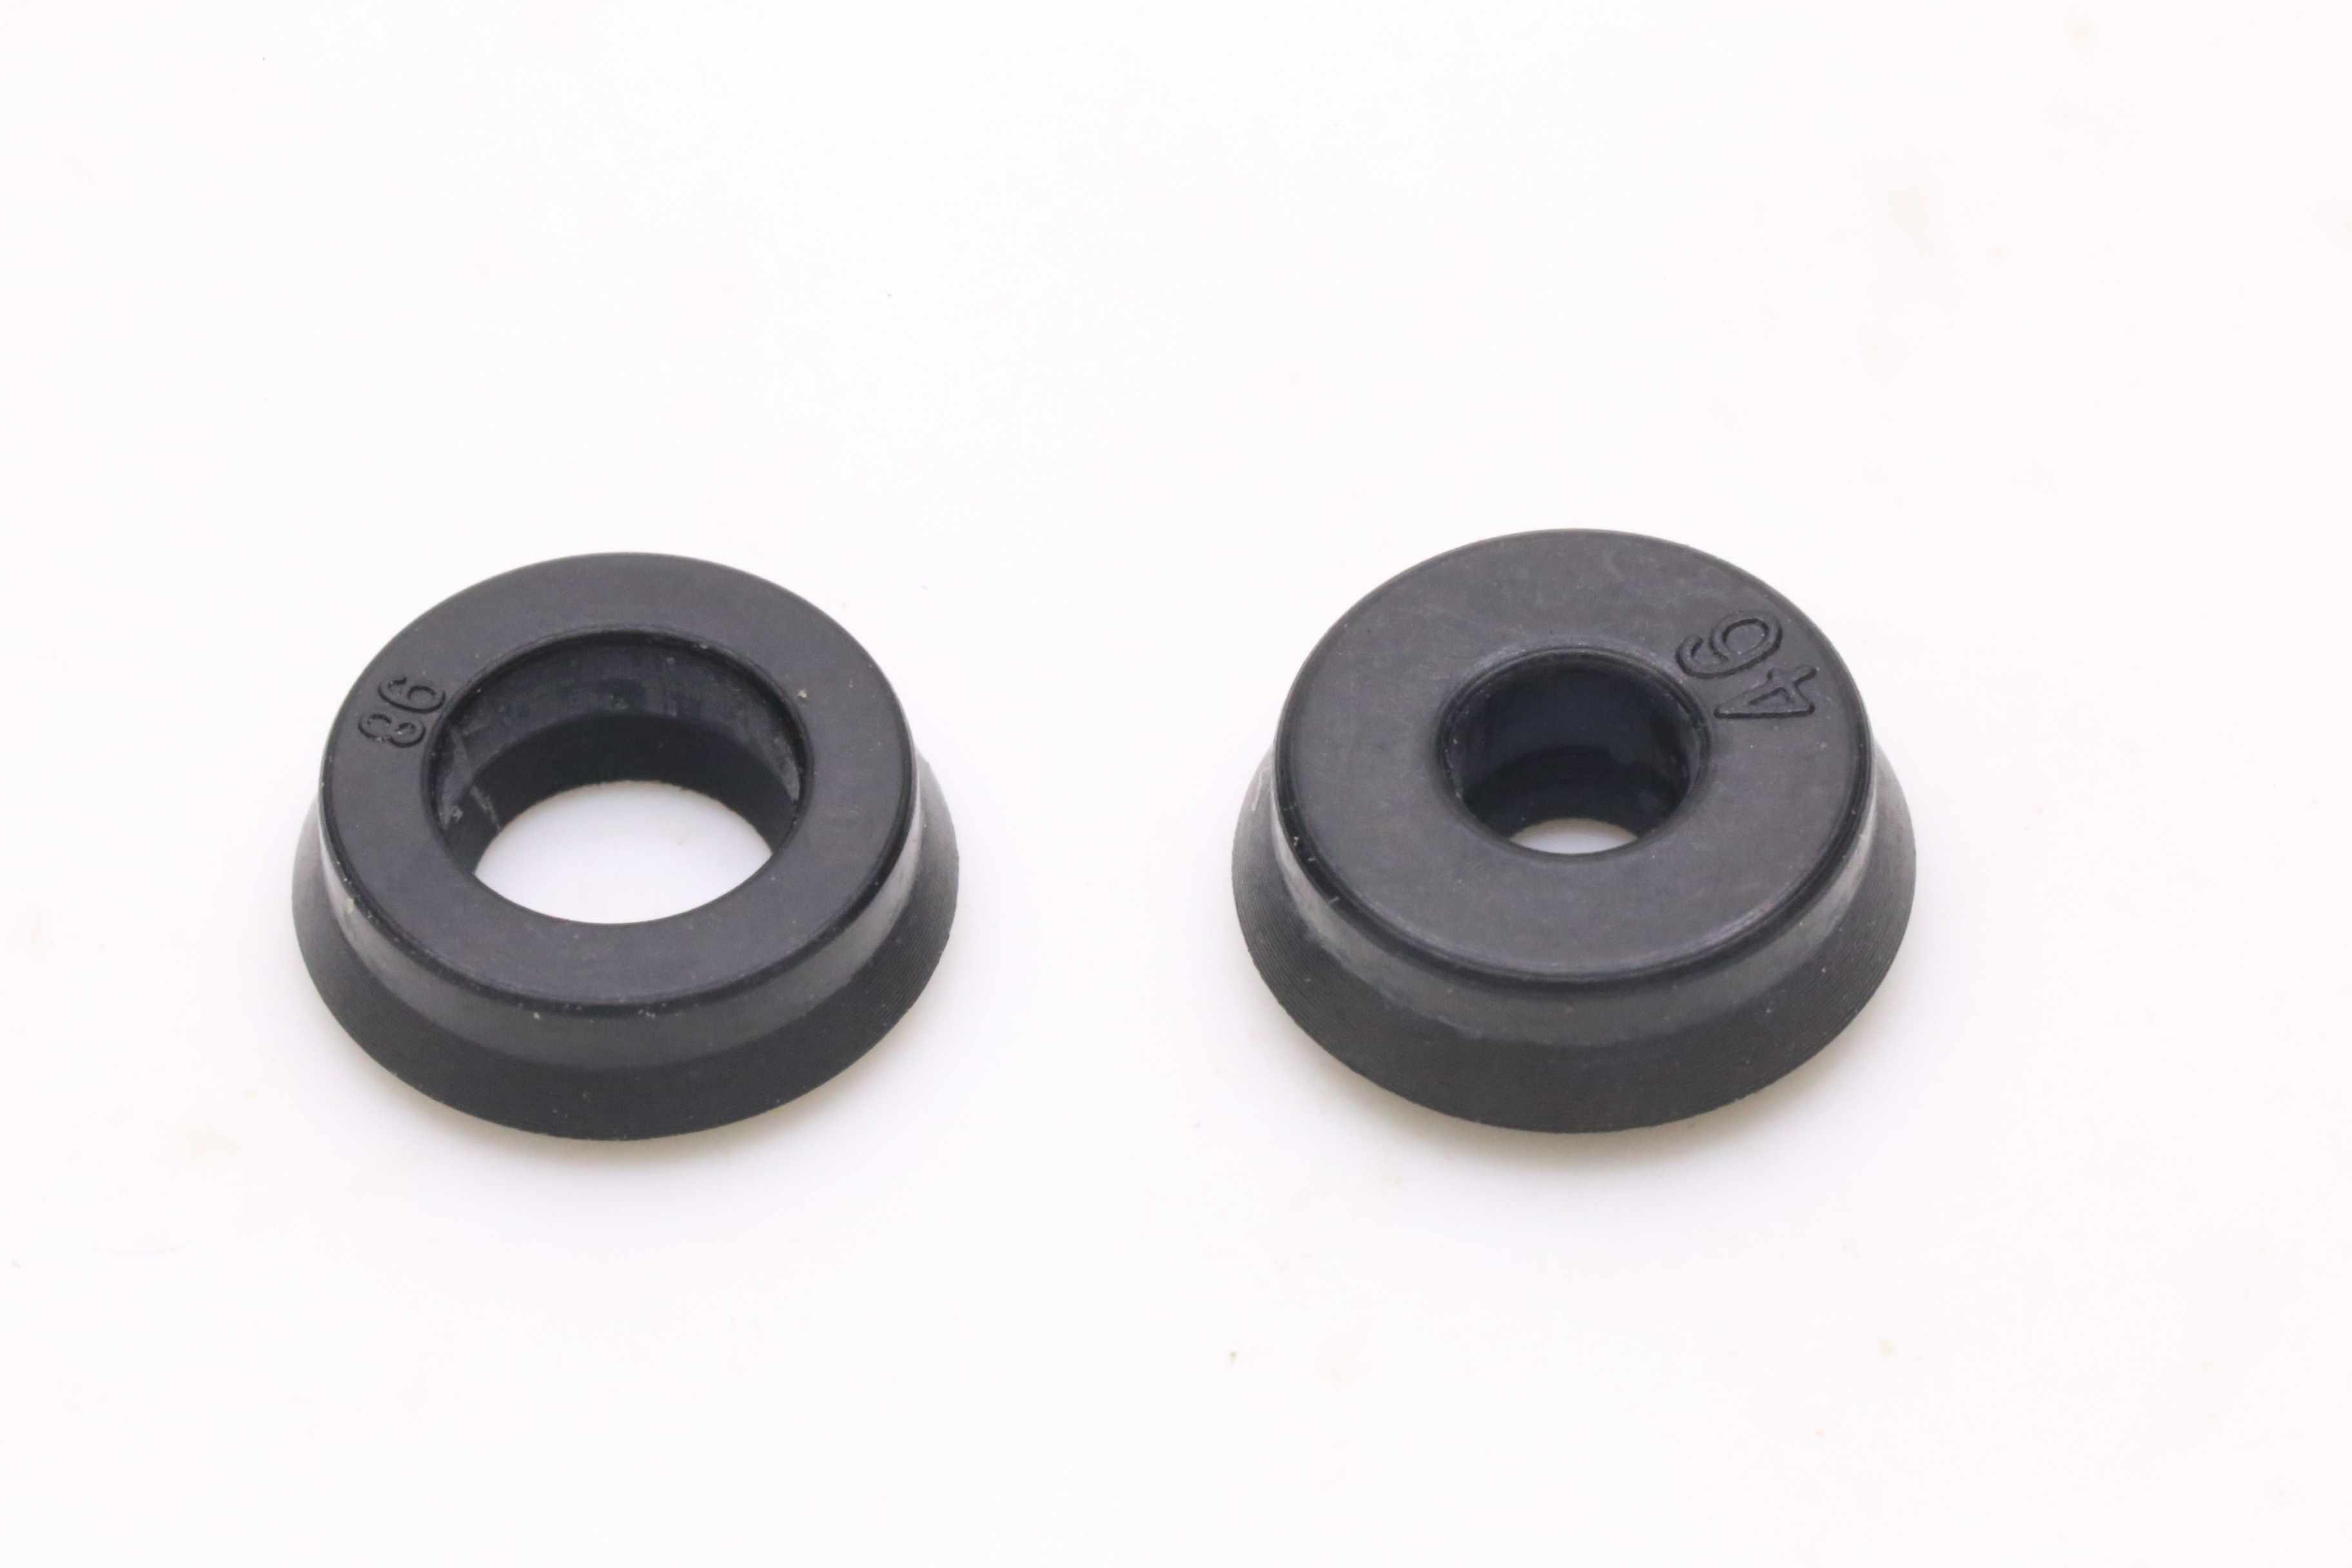 Brake Lever Internals Rebuild Part Rubber Oil Seal Ring for sram GUIDE Level db5